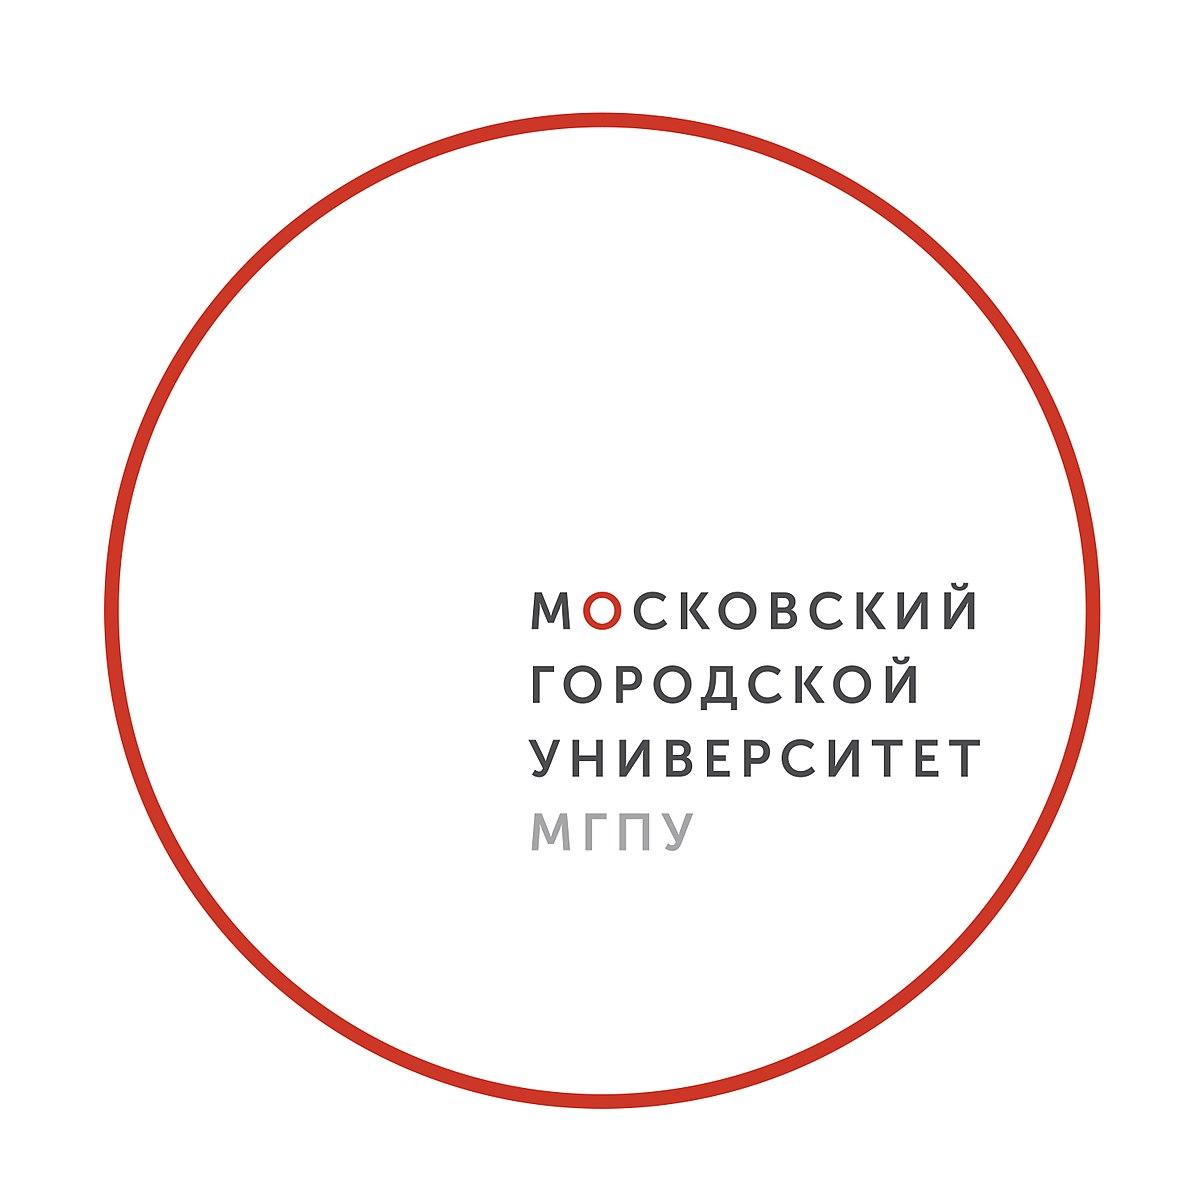 мгпу официальный сайт дизайн